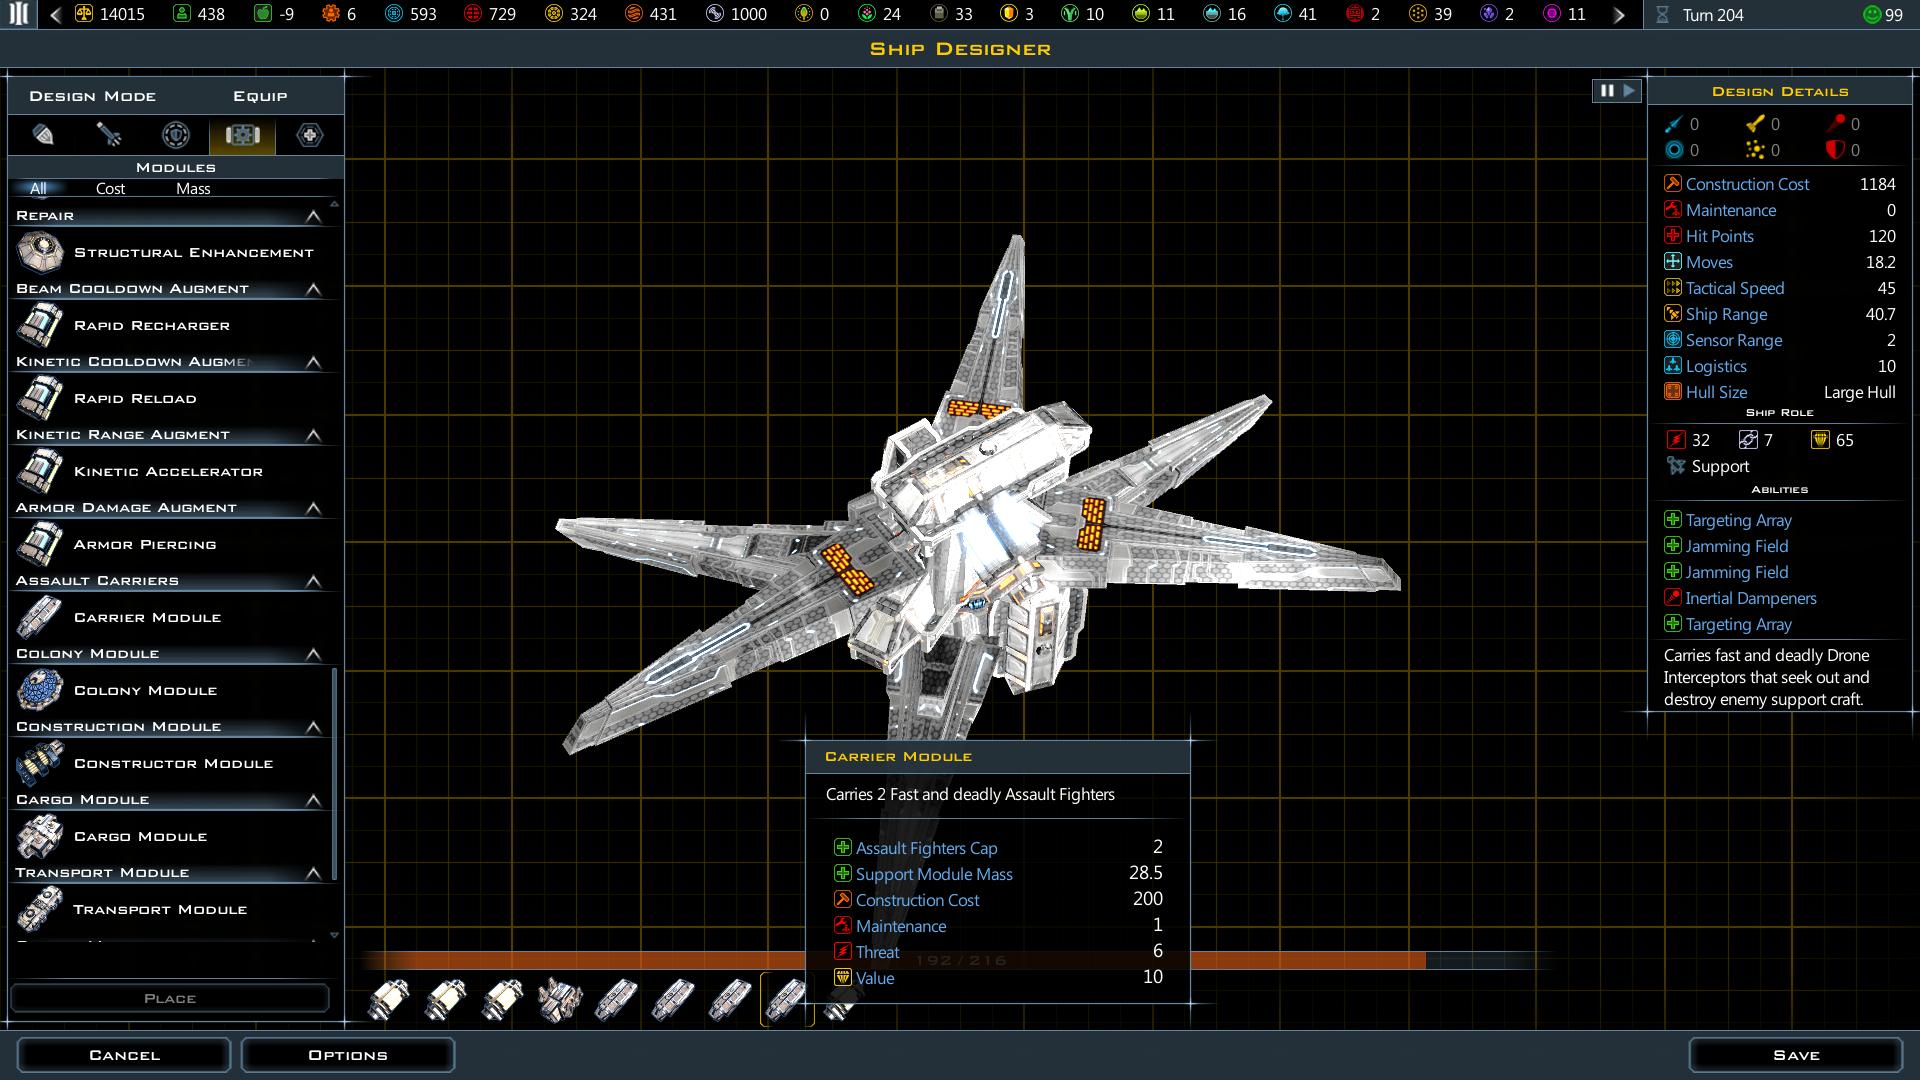 Carrier Module